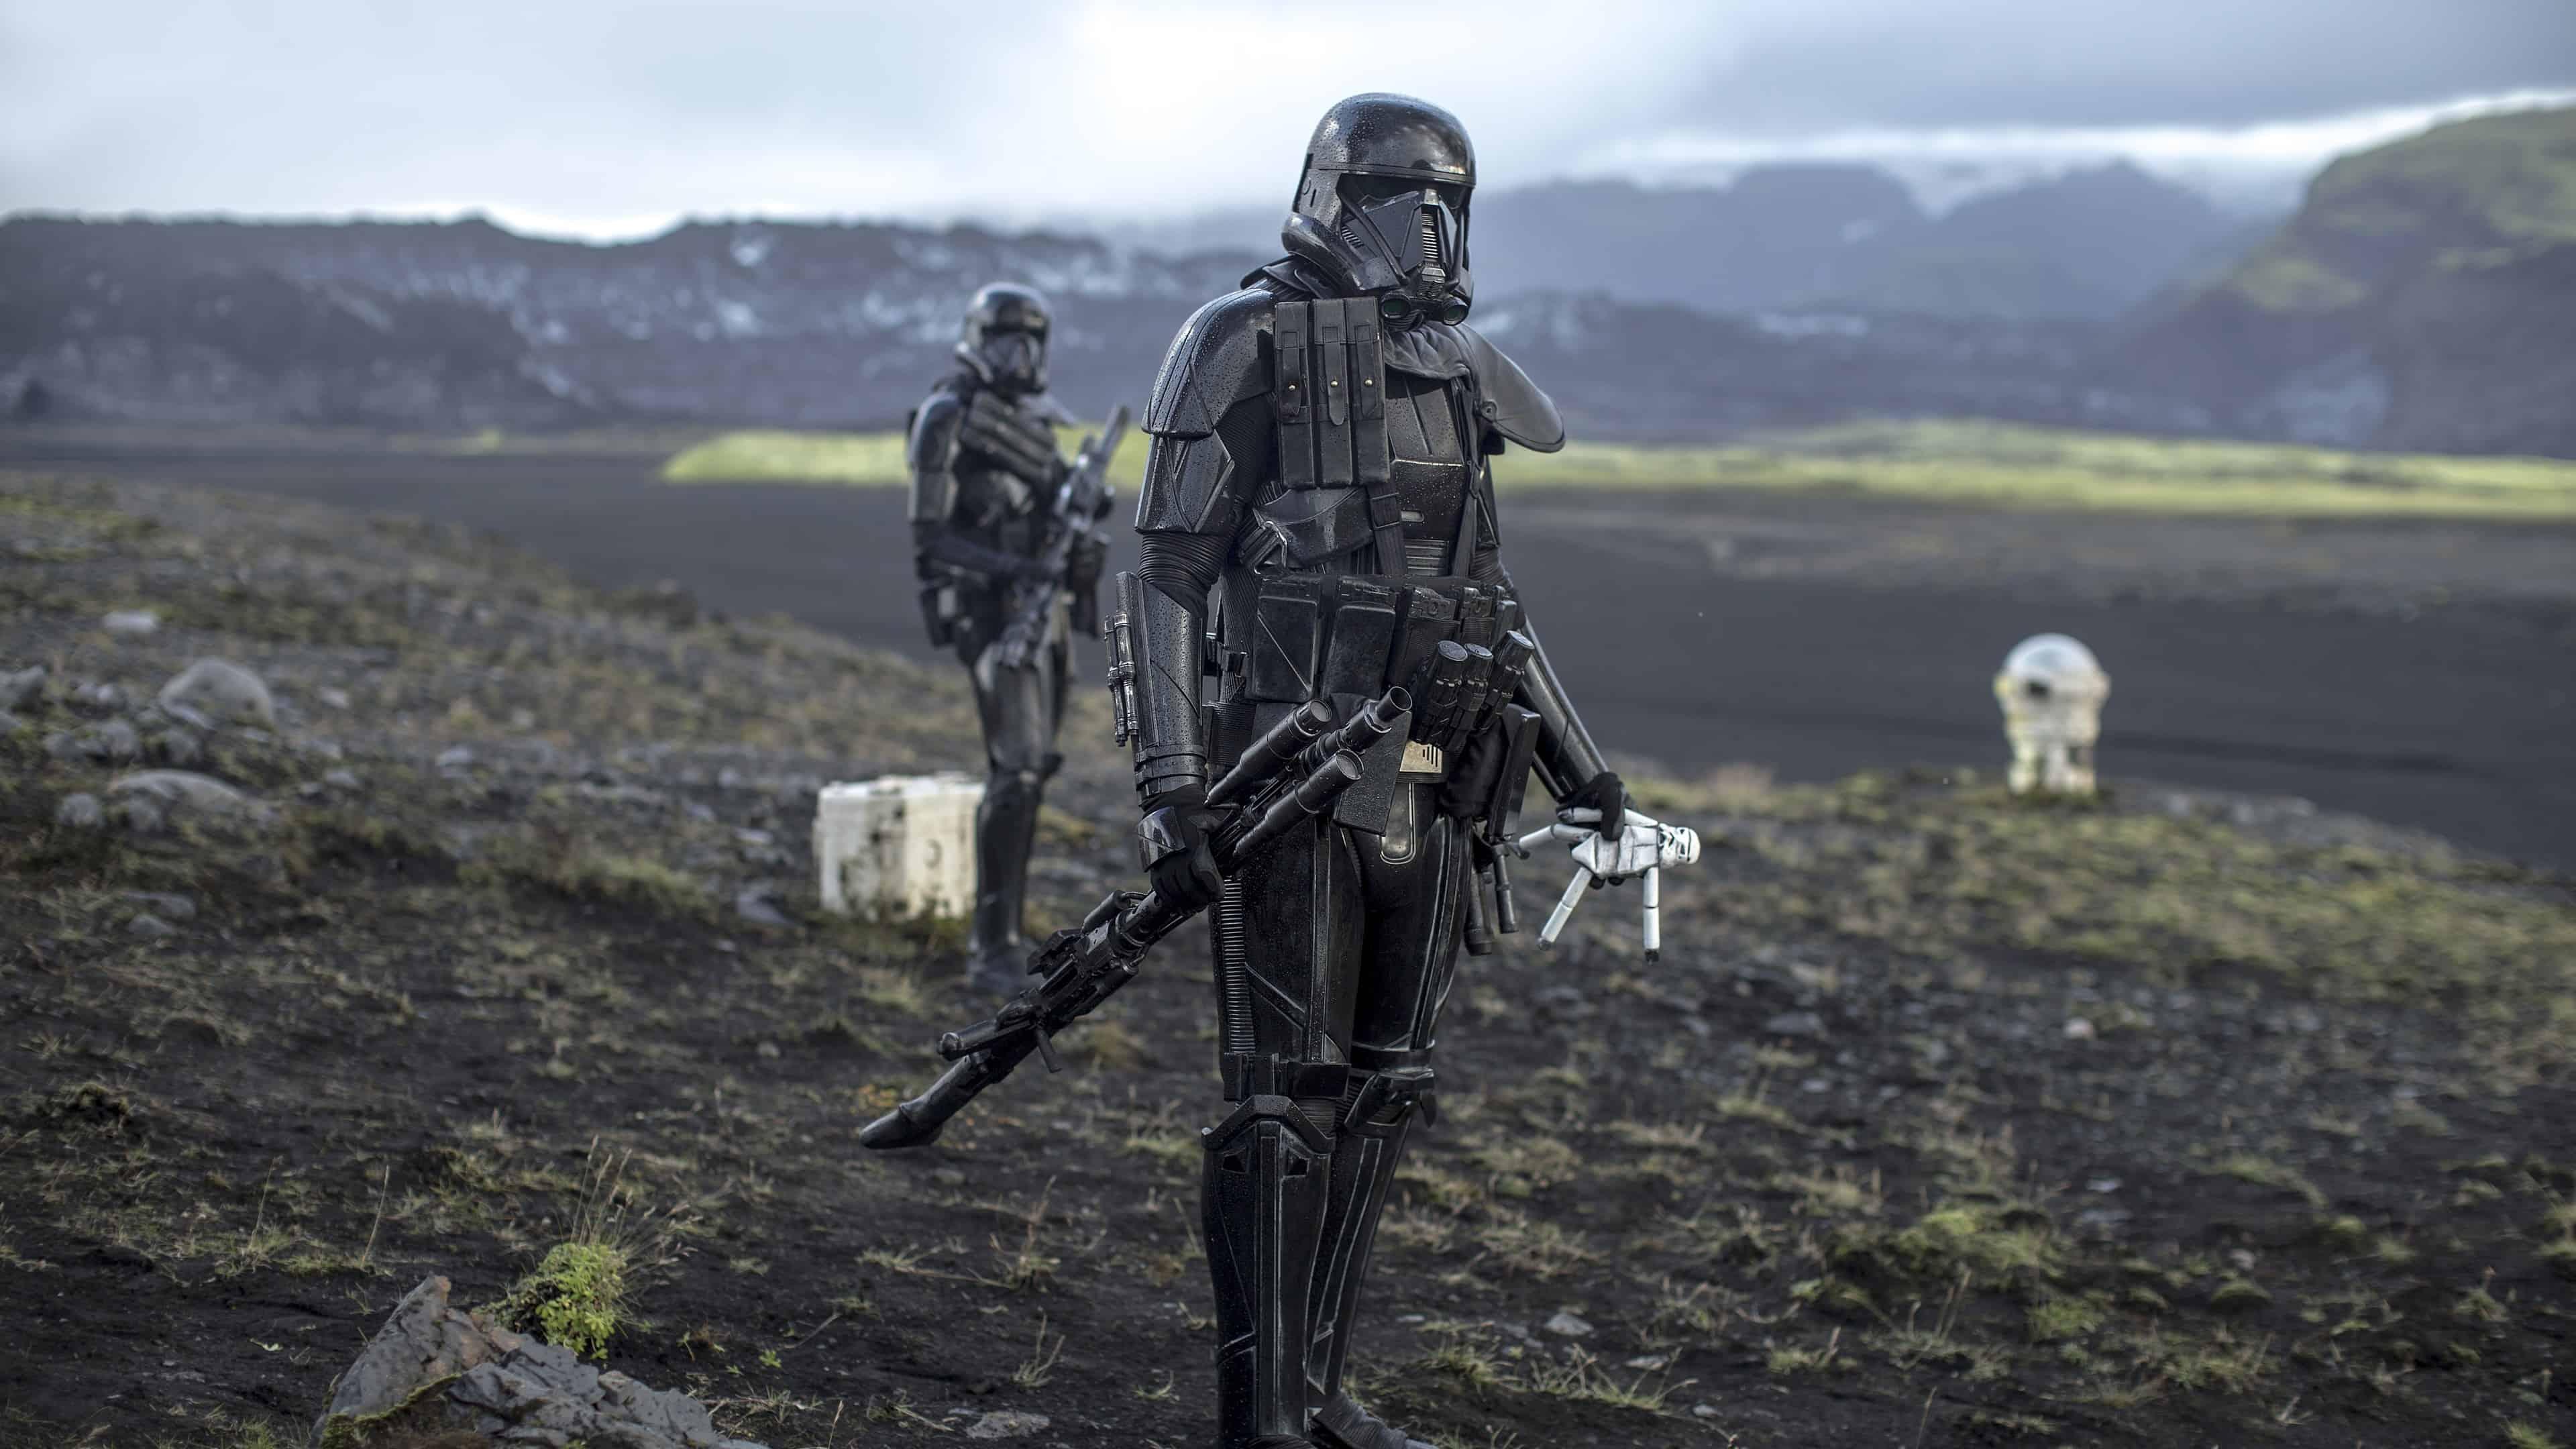 Rogue One A Star Wars Story Trooper Uhd 4k Wallpaper Pixelz